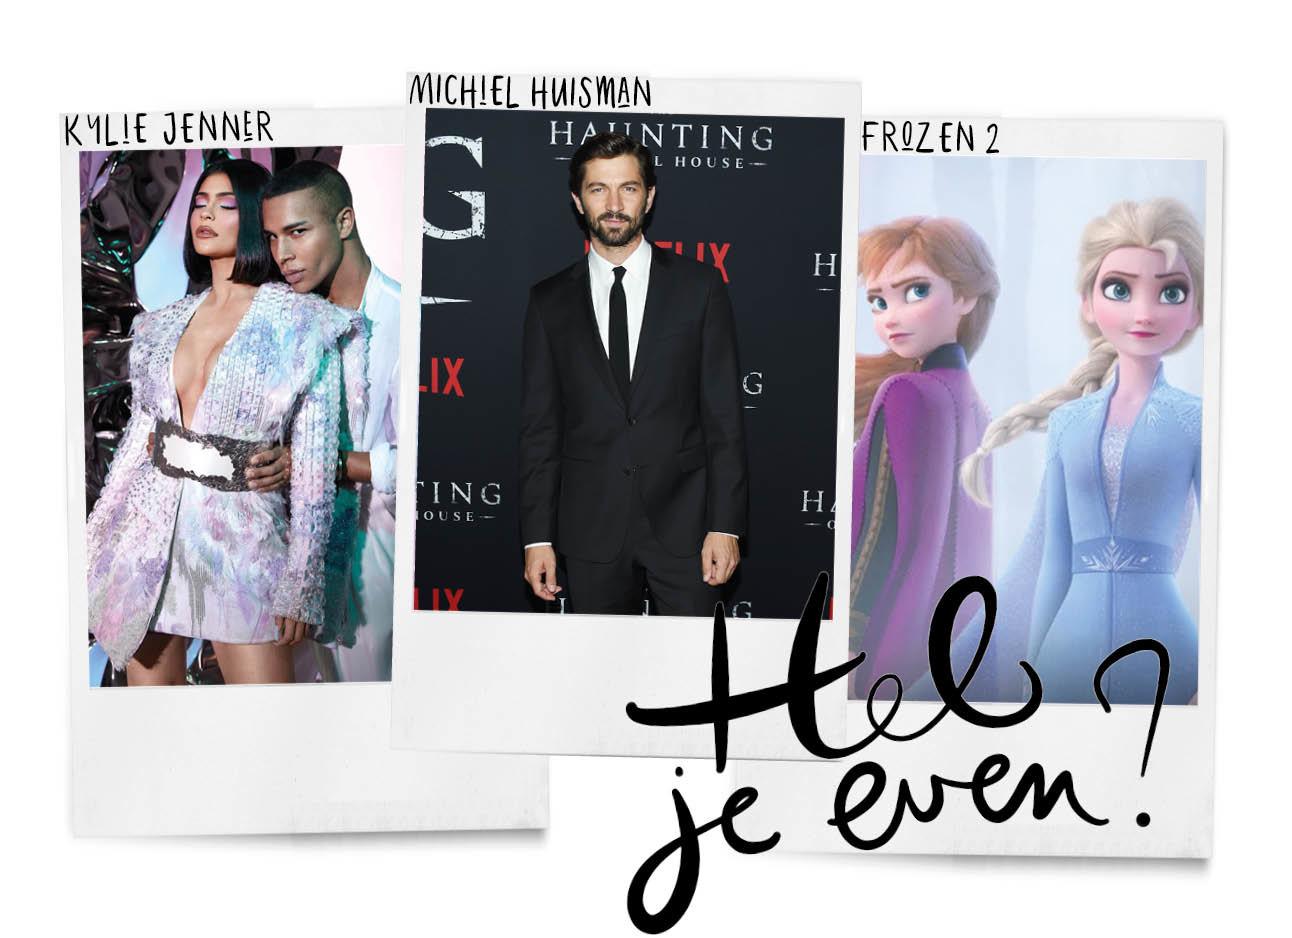 kylie jenner Balmain, Michiel huisman en frozen trailer